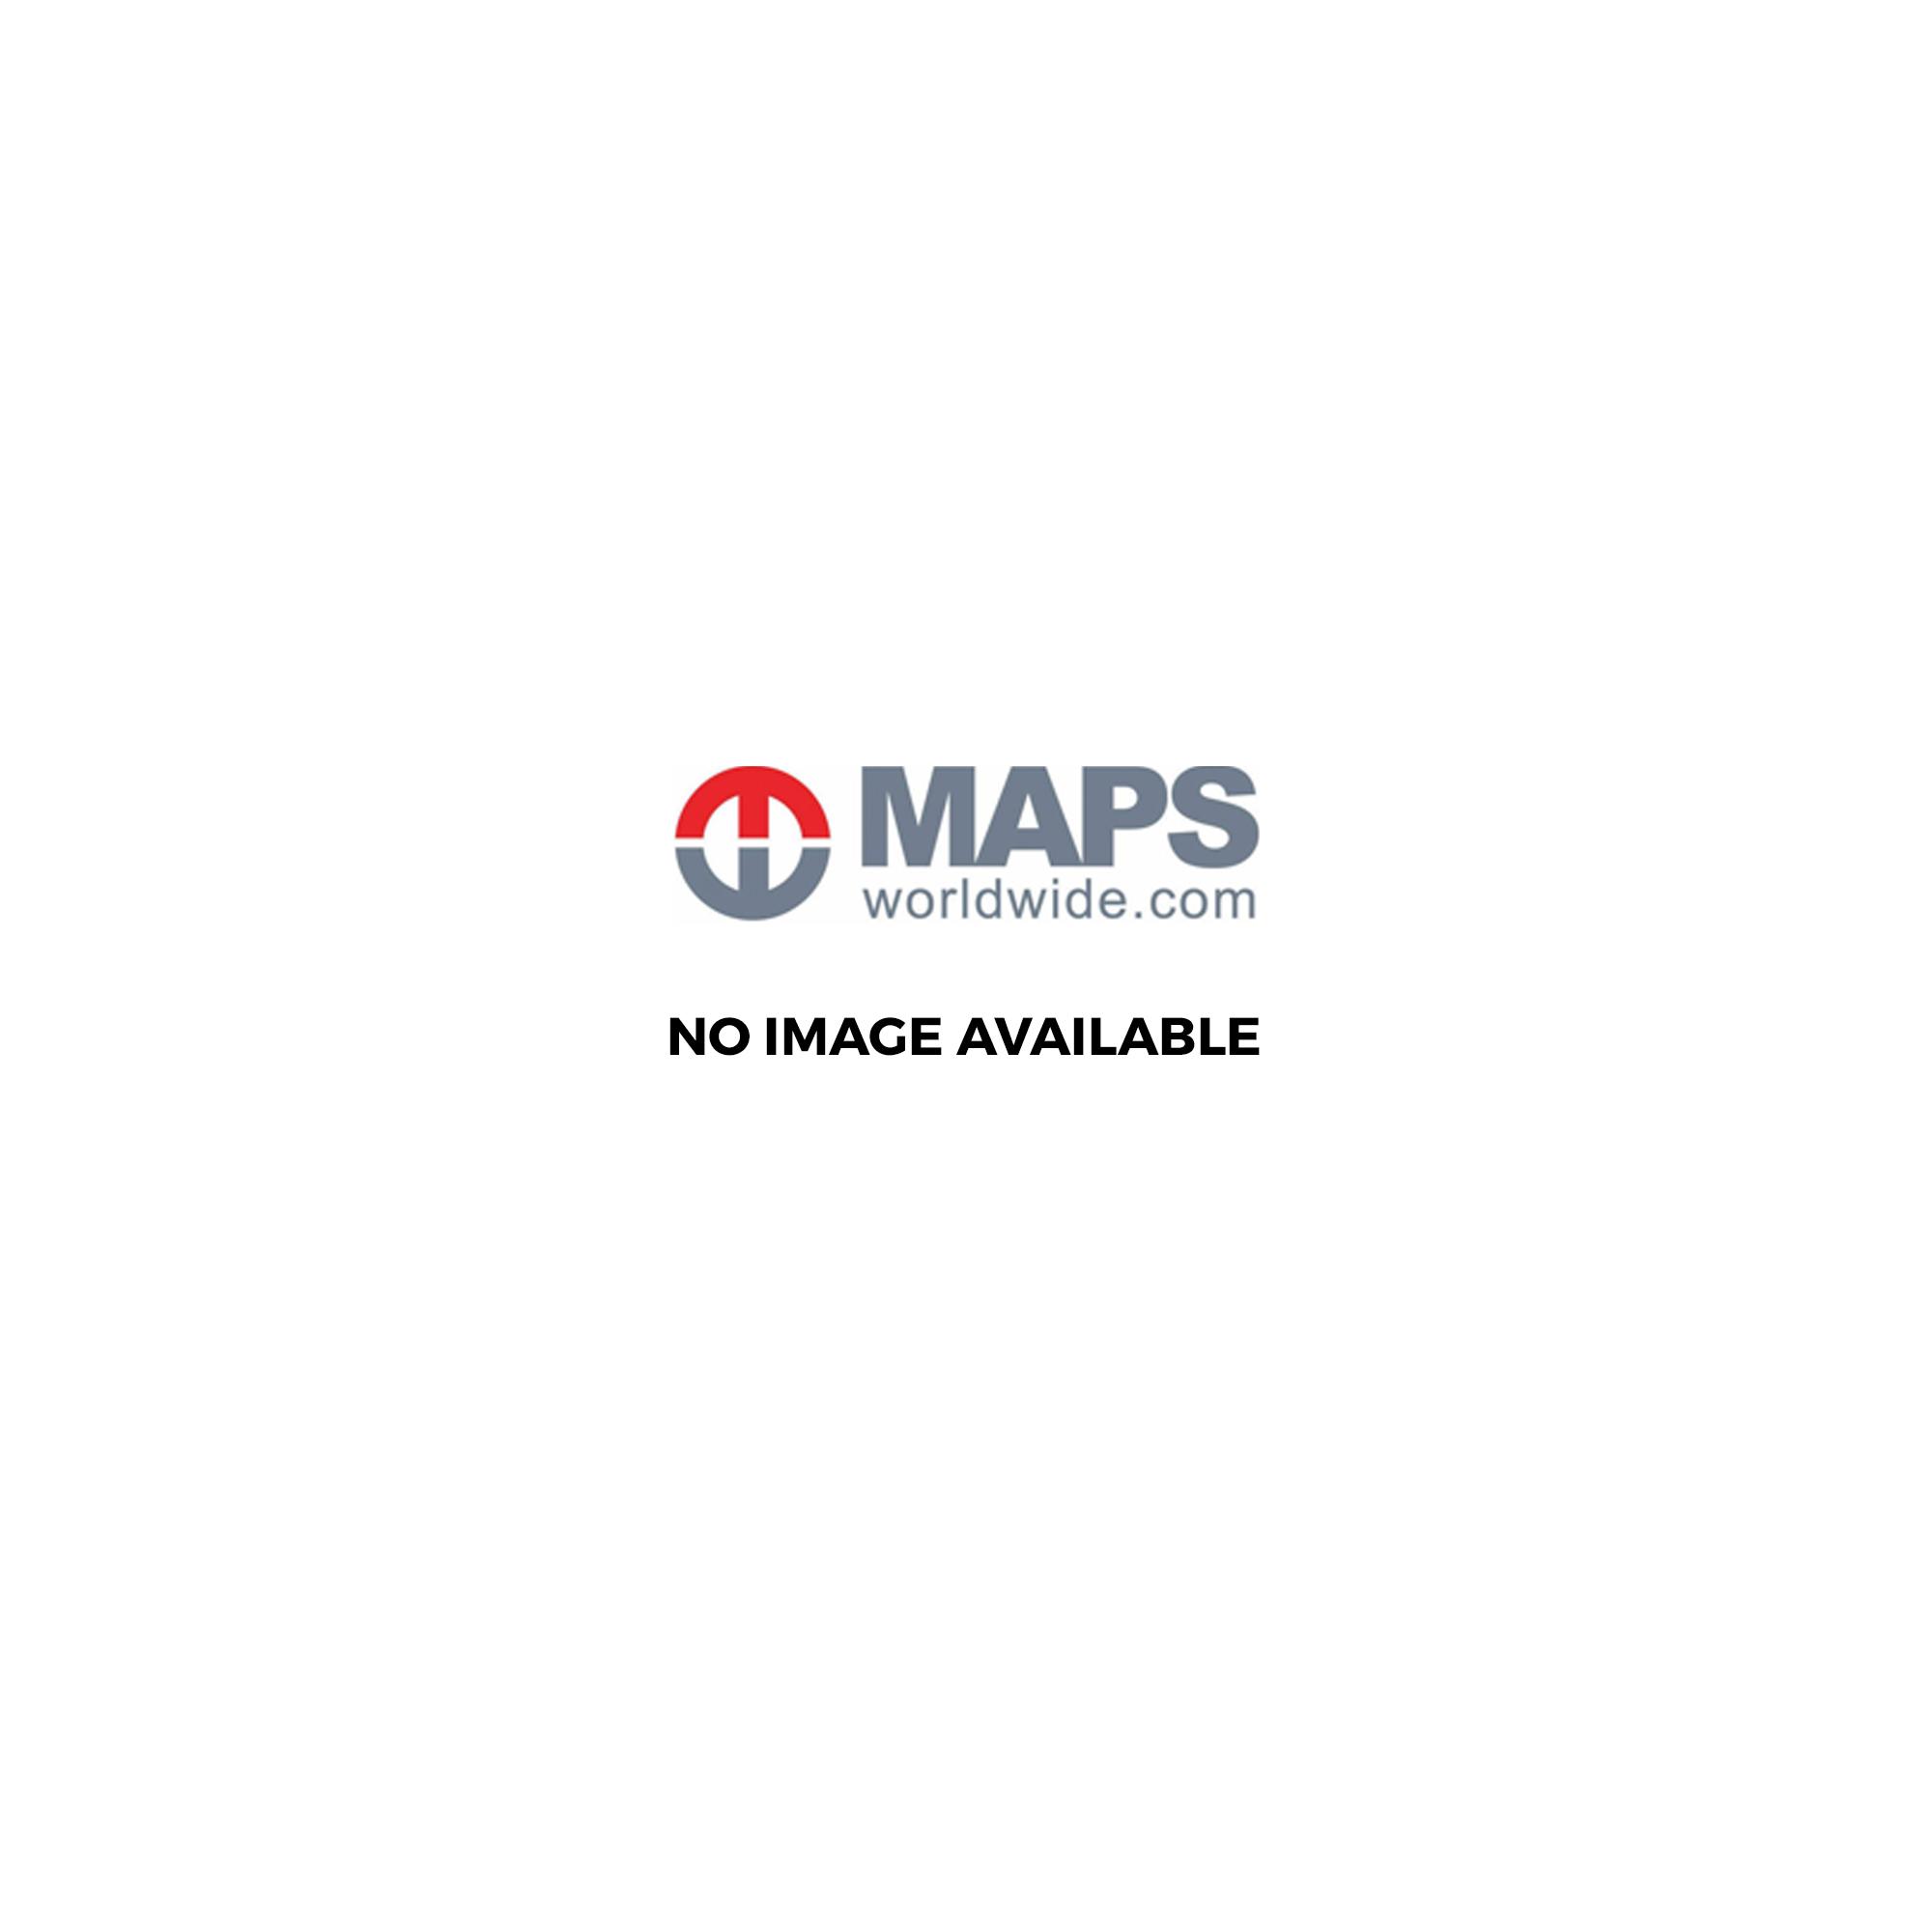 Southwest road Guide - map USA/6 - Hallwag + Kummerley & Frey on